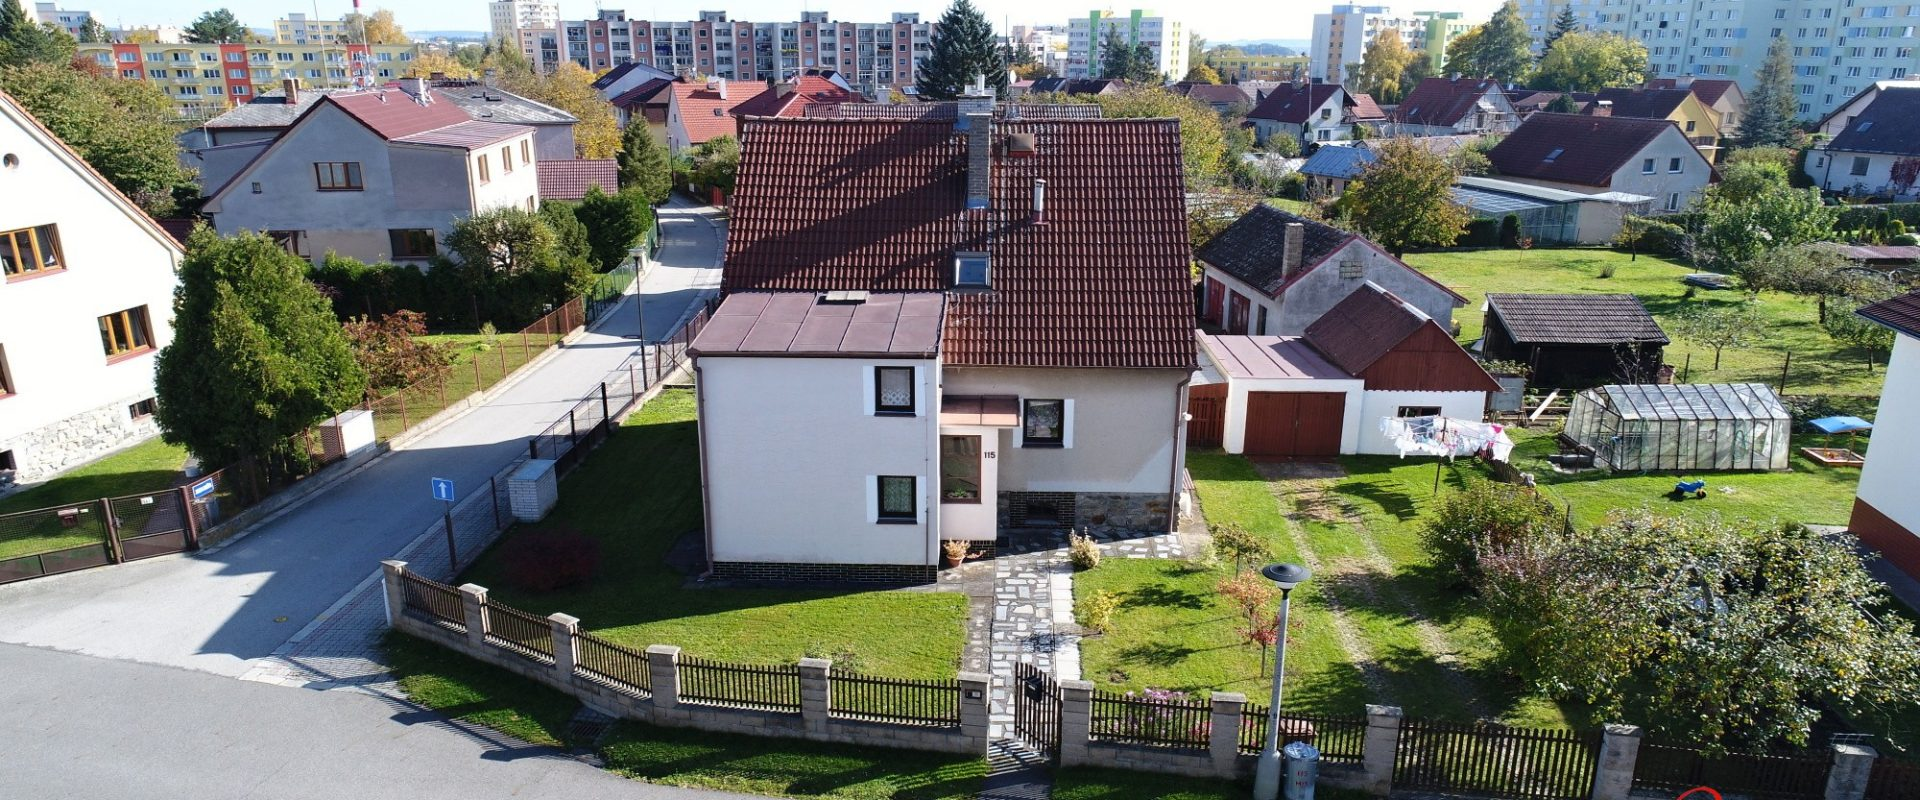 RD 5+2, Tábor (Klokoty) 152 m2 na pozemku 501 m2.